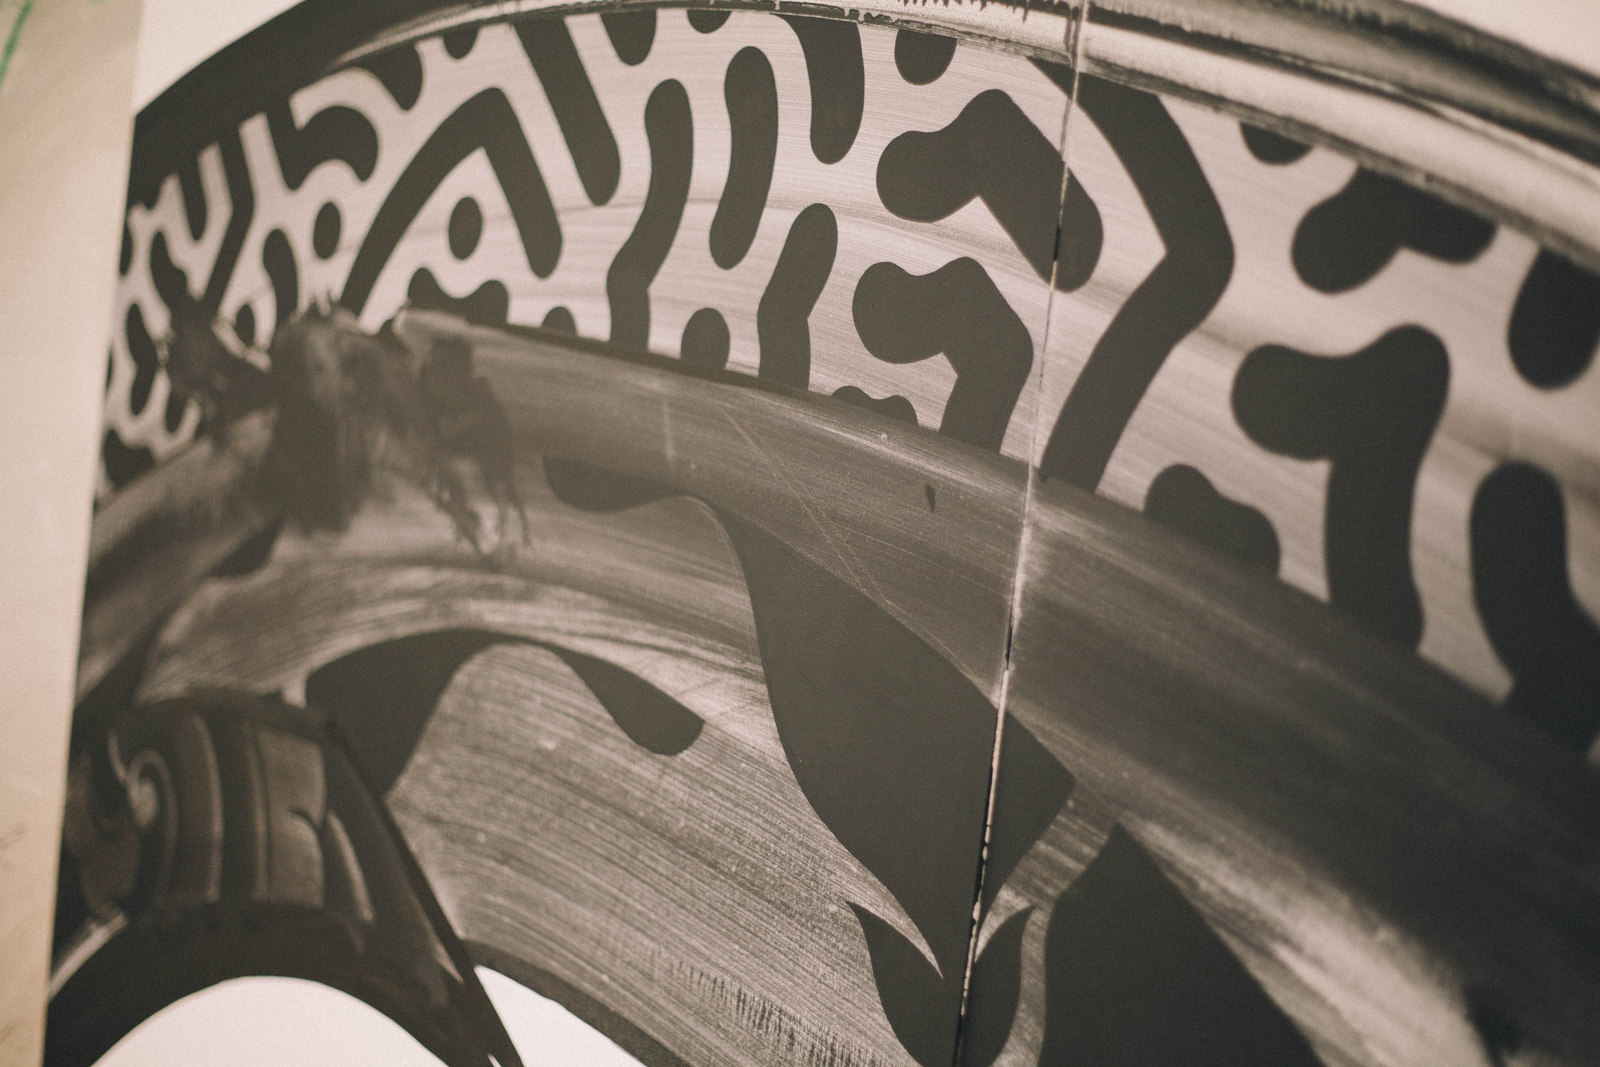 IMG_1353 国内外で活躍するアーティスト4組の「作品の向こう側」| ジャーナル スタンダード「オムニバス展」密着レポート!